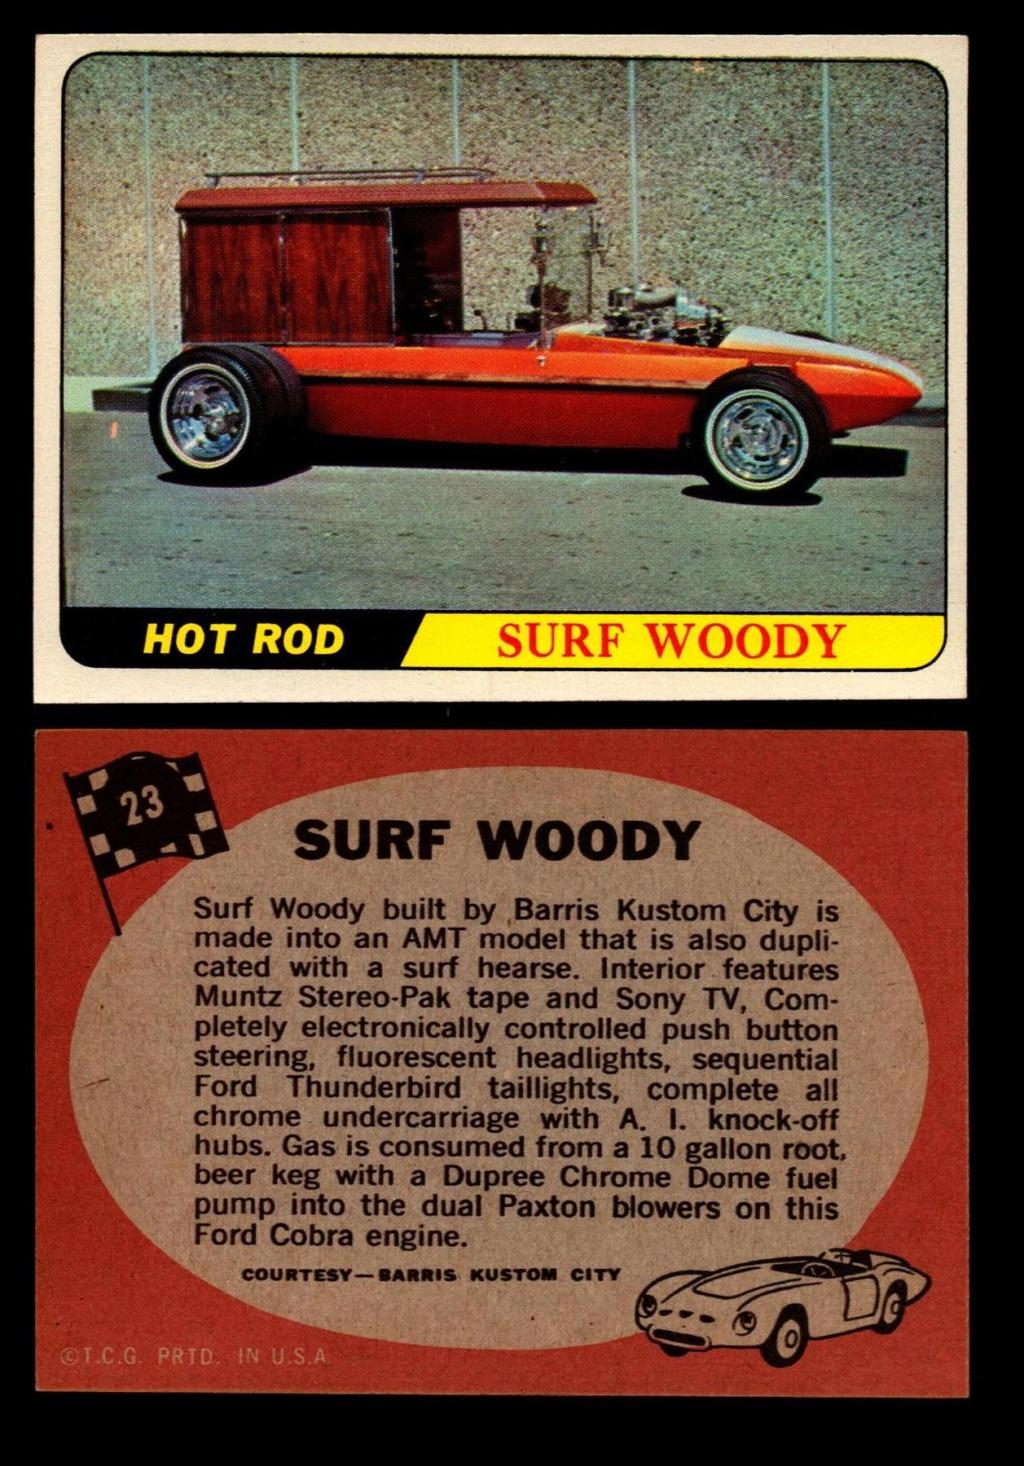 Hot Rods Topps - Vintage Trading Cards 1968 - Custom car - Dragster - Racer - Dream car - Barris Kustom City - Ed Roth Darrill Starbird, Gene Winfield, Bill Cuchenberry 23_e4c10